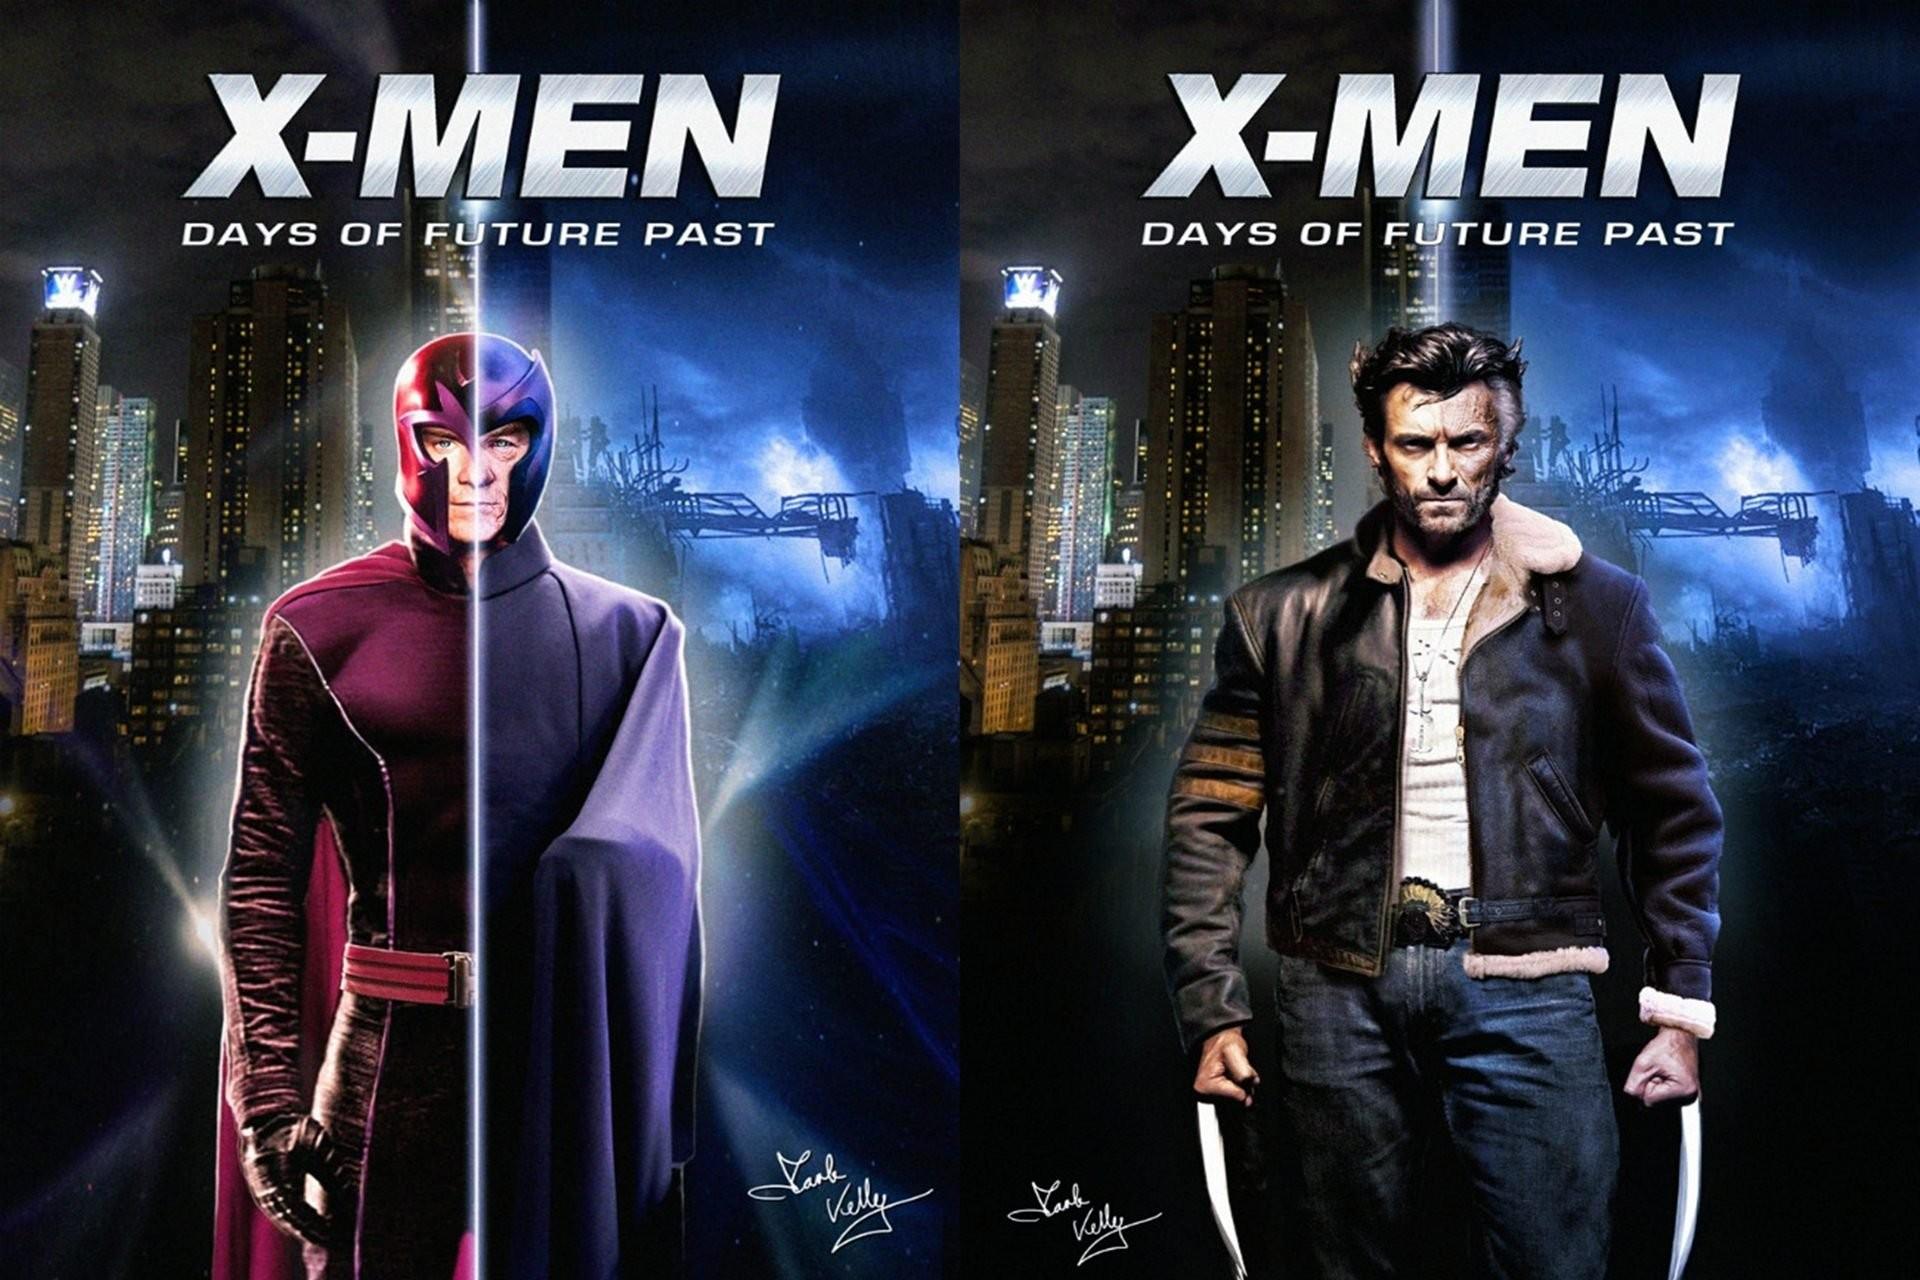 Xmen Xmen Film Movie Fantasy Movie Images Men Action HD 1920x1280